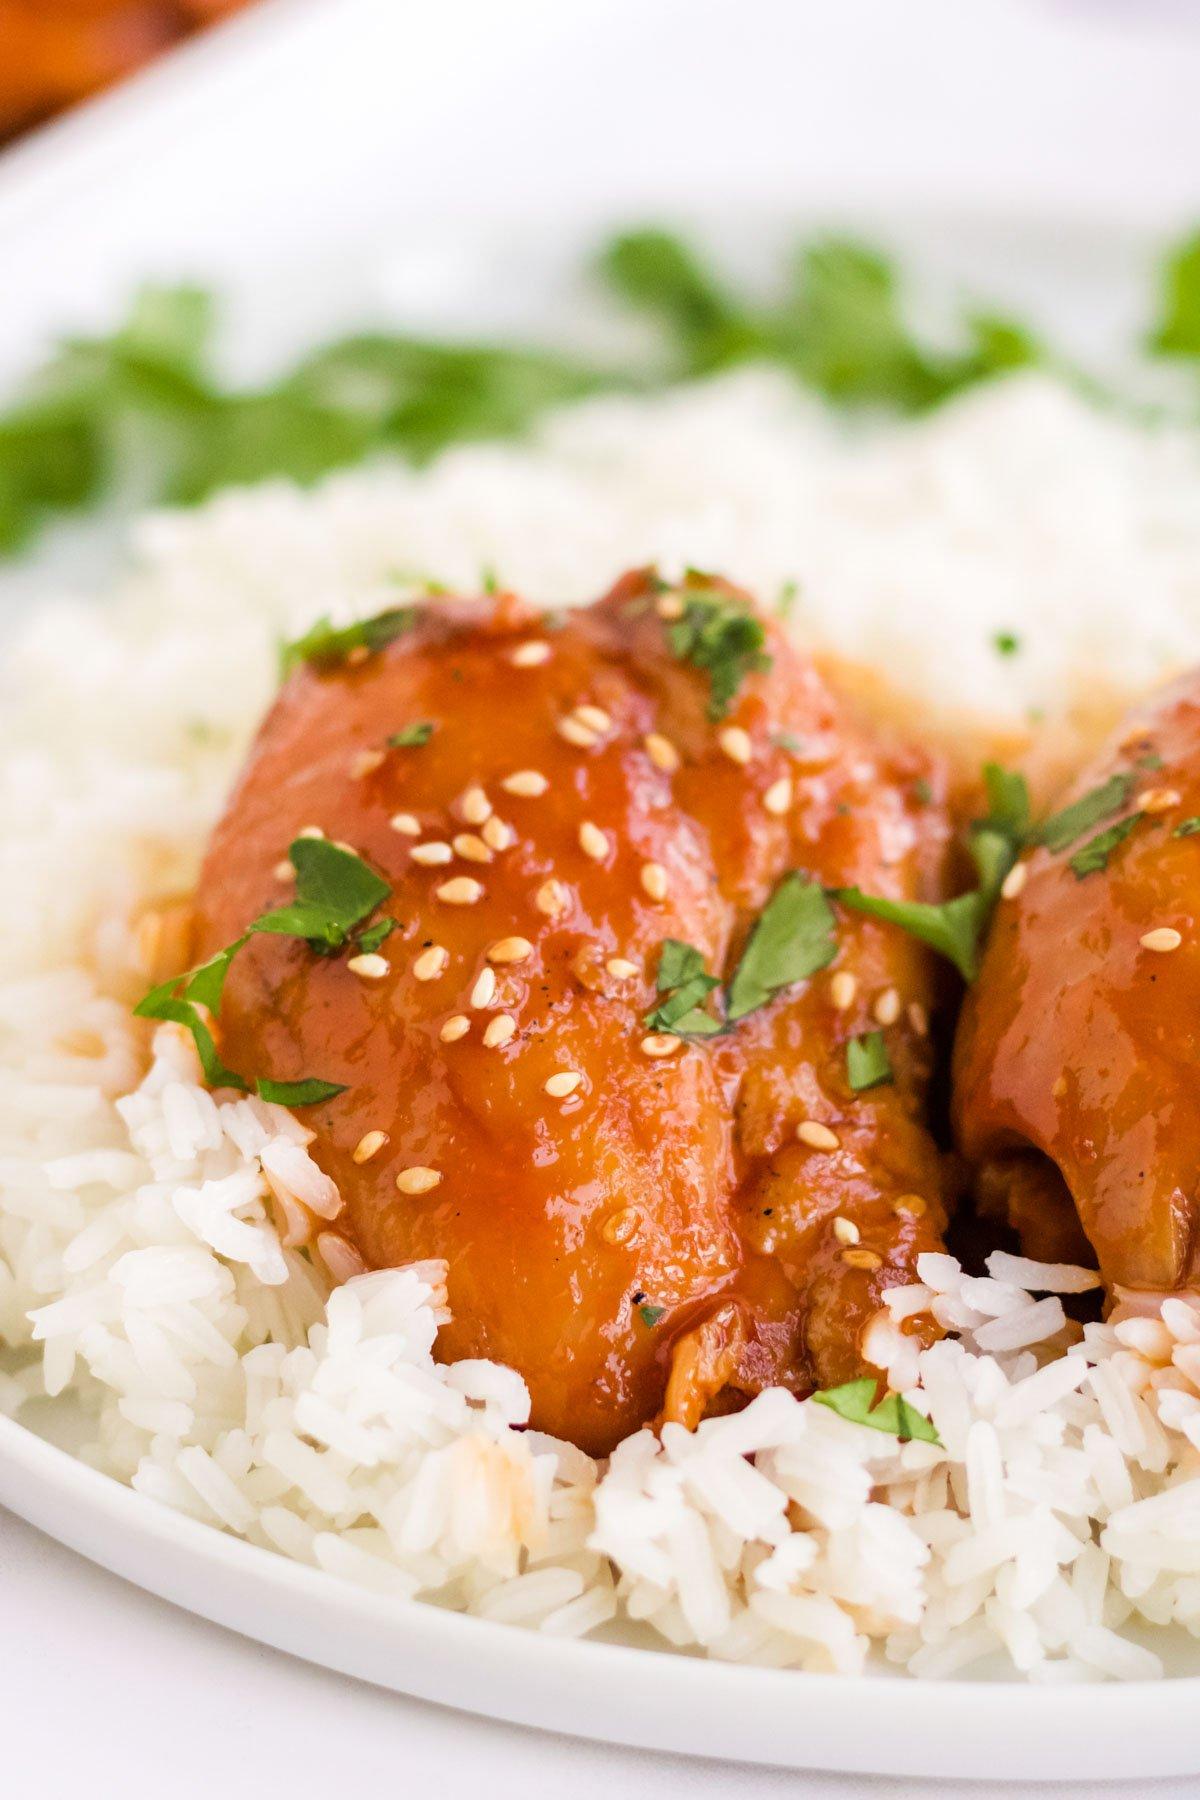 saucy chicken thigh over rice